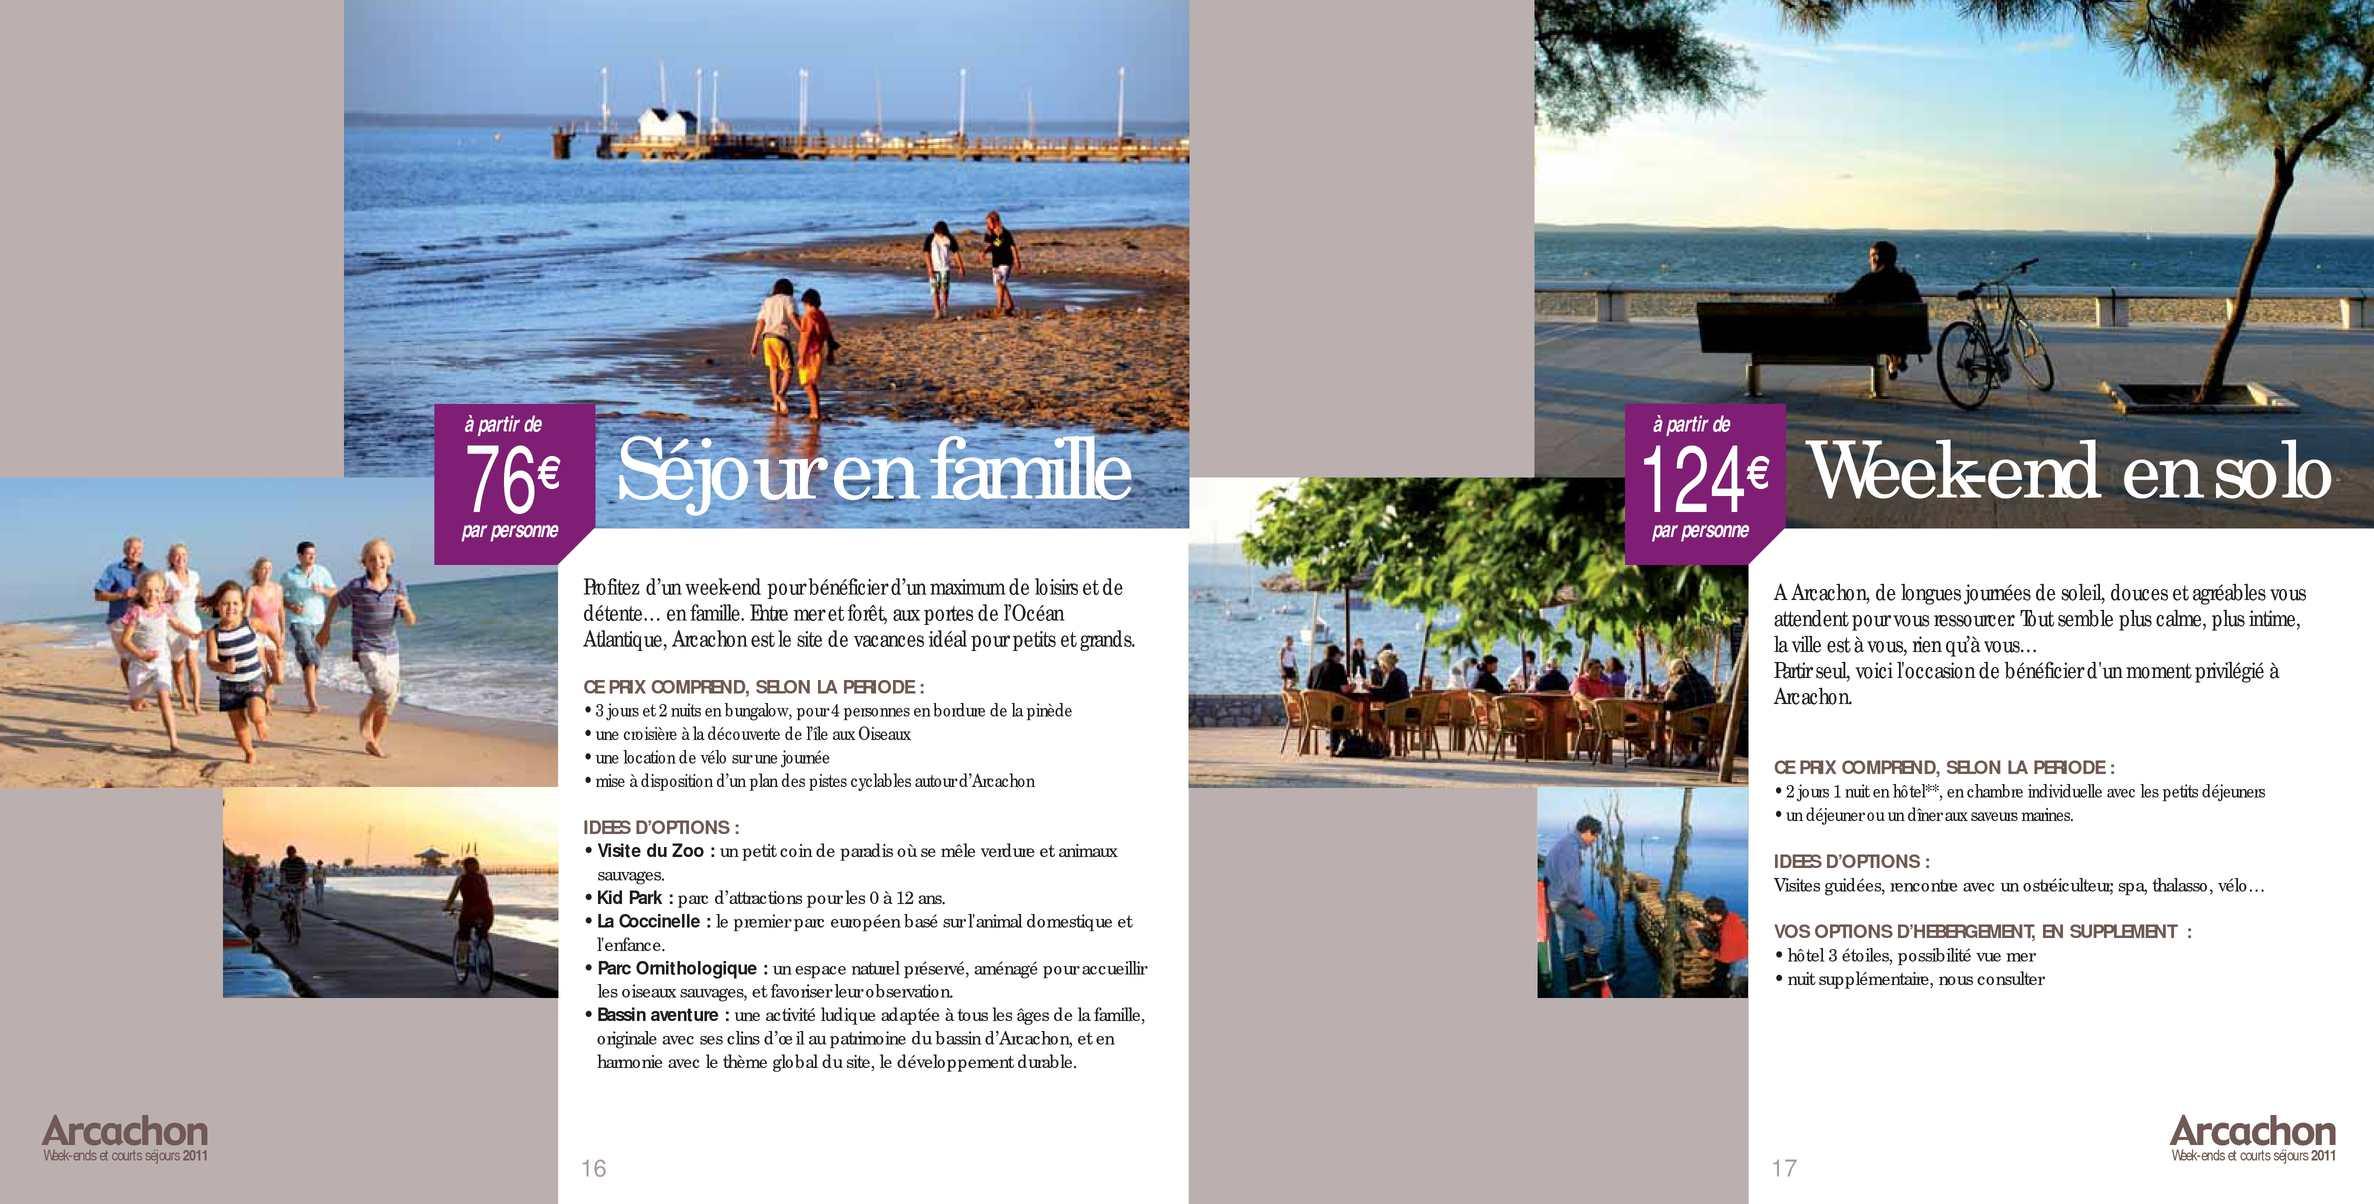 Weekends Office De Tourisme D Arcachon Calameo Downloader